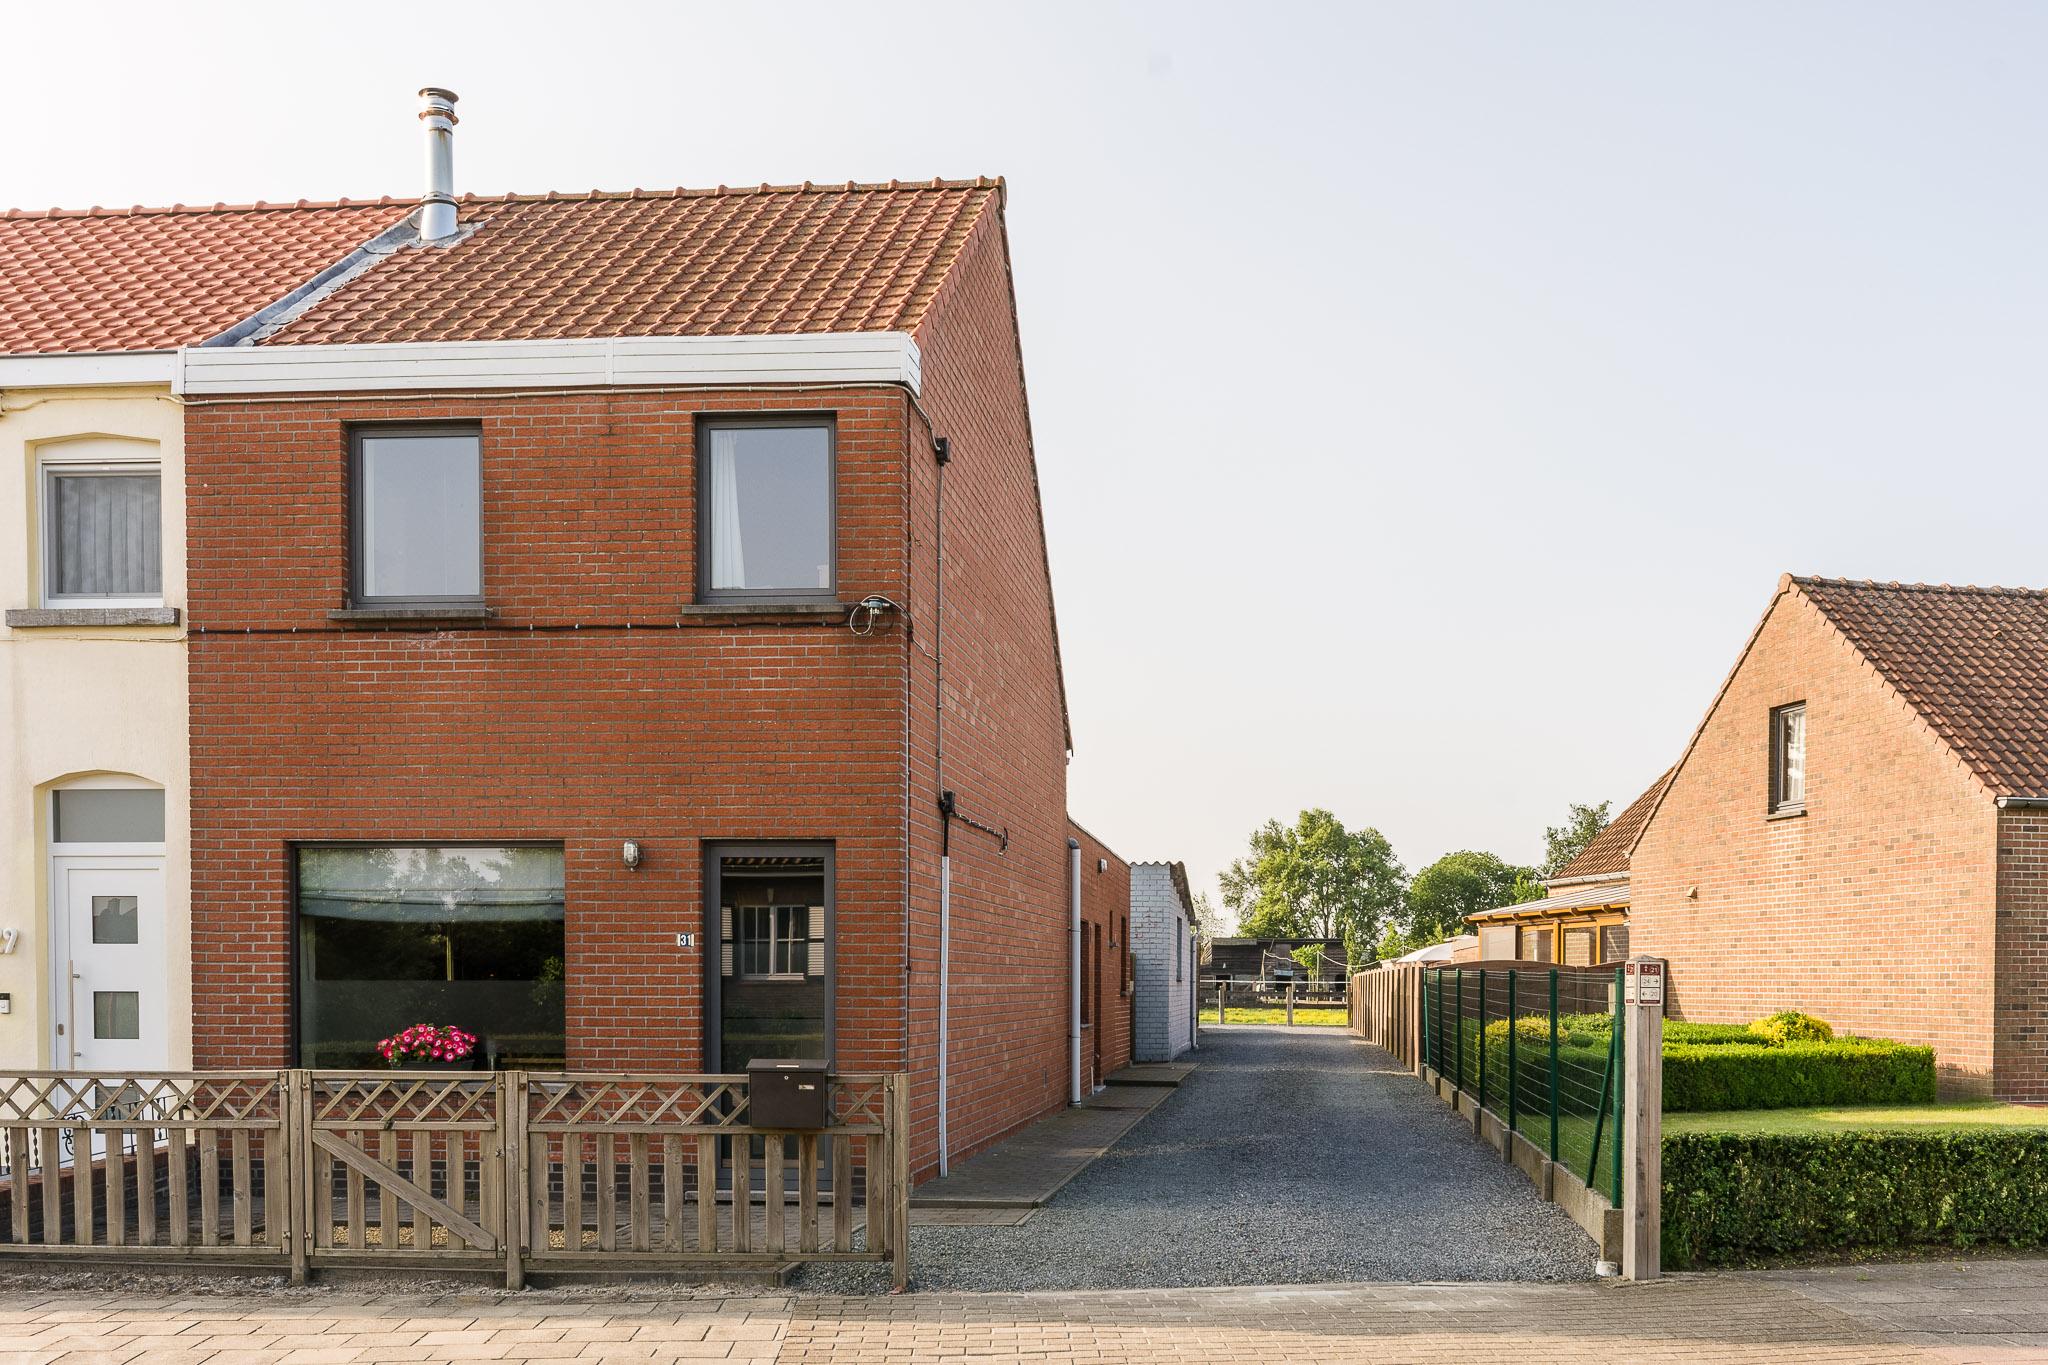 Recent gerenoveerde woning te koop – Bellebargie 31, Waarschoot – Lievegem